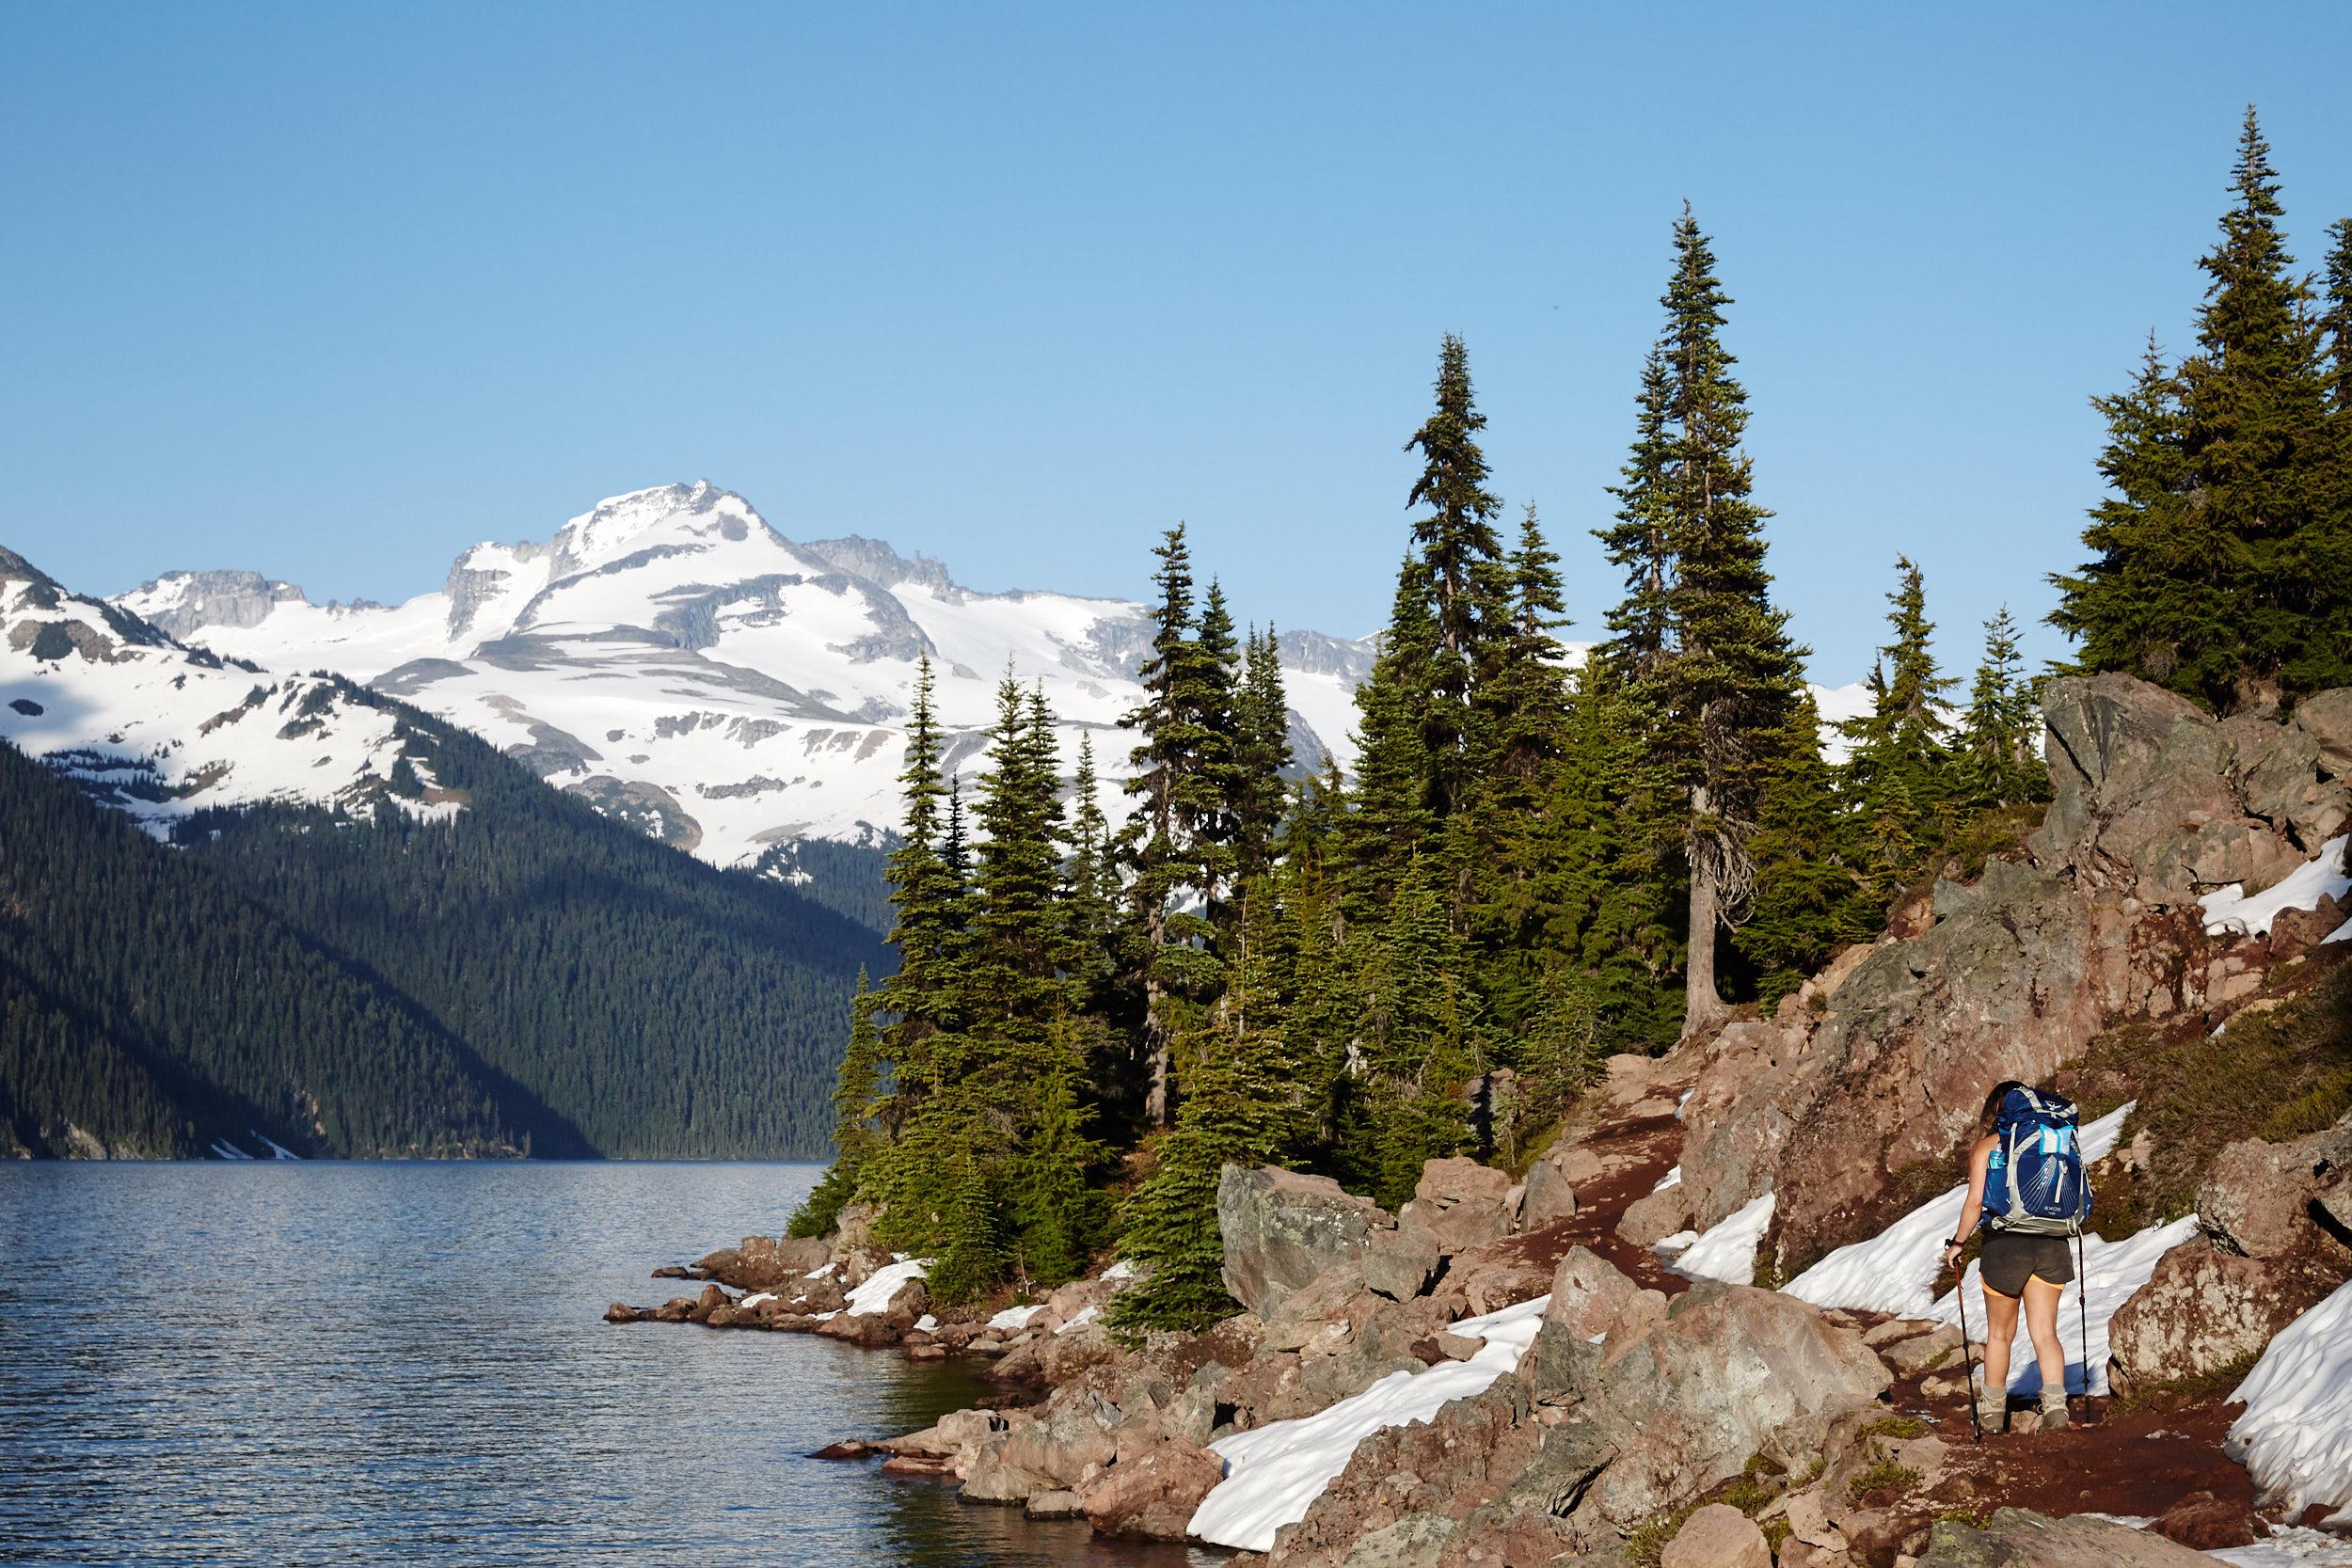 Camping at Garibaldi Lake 5.jpg